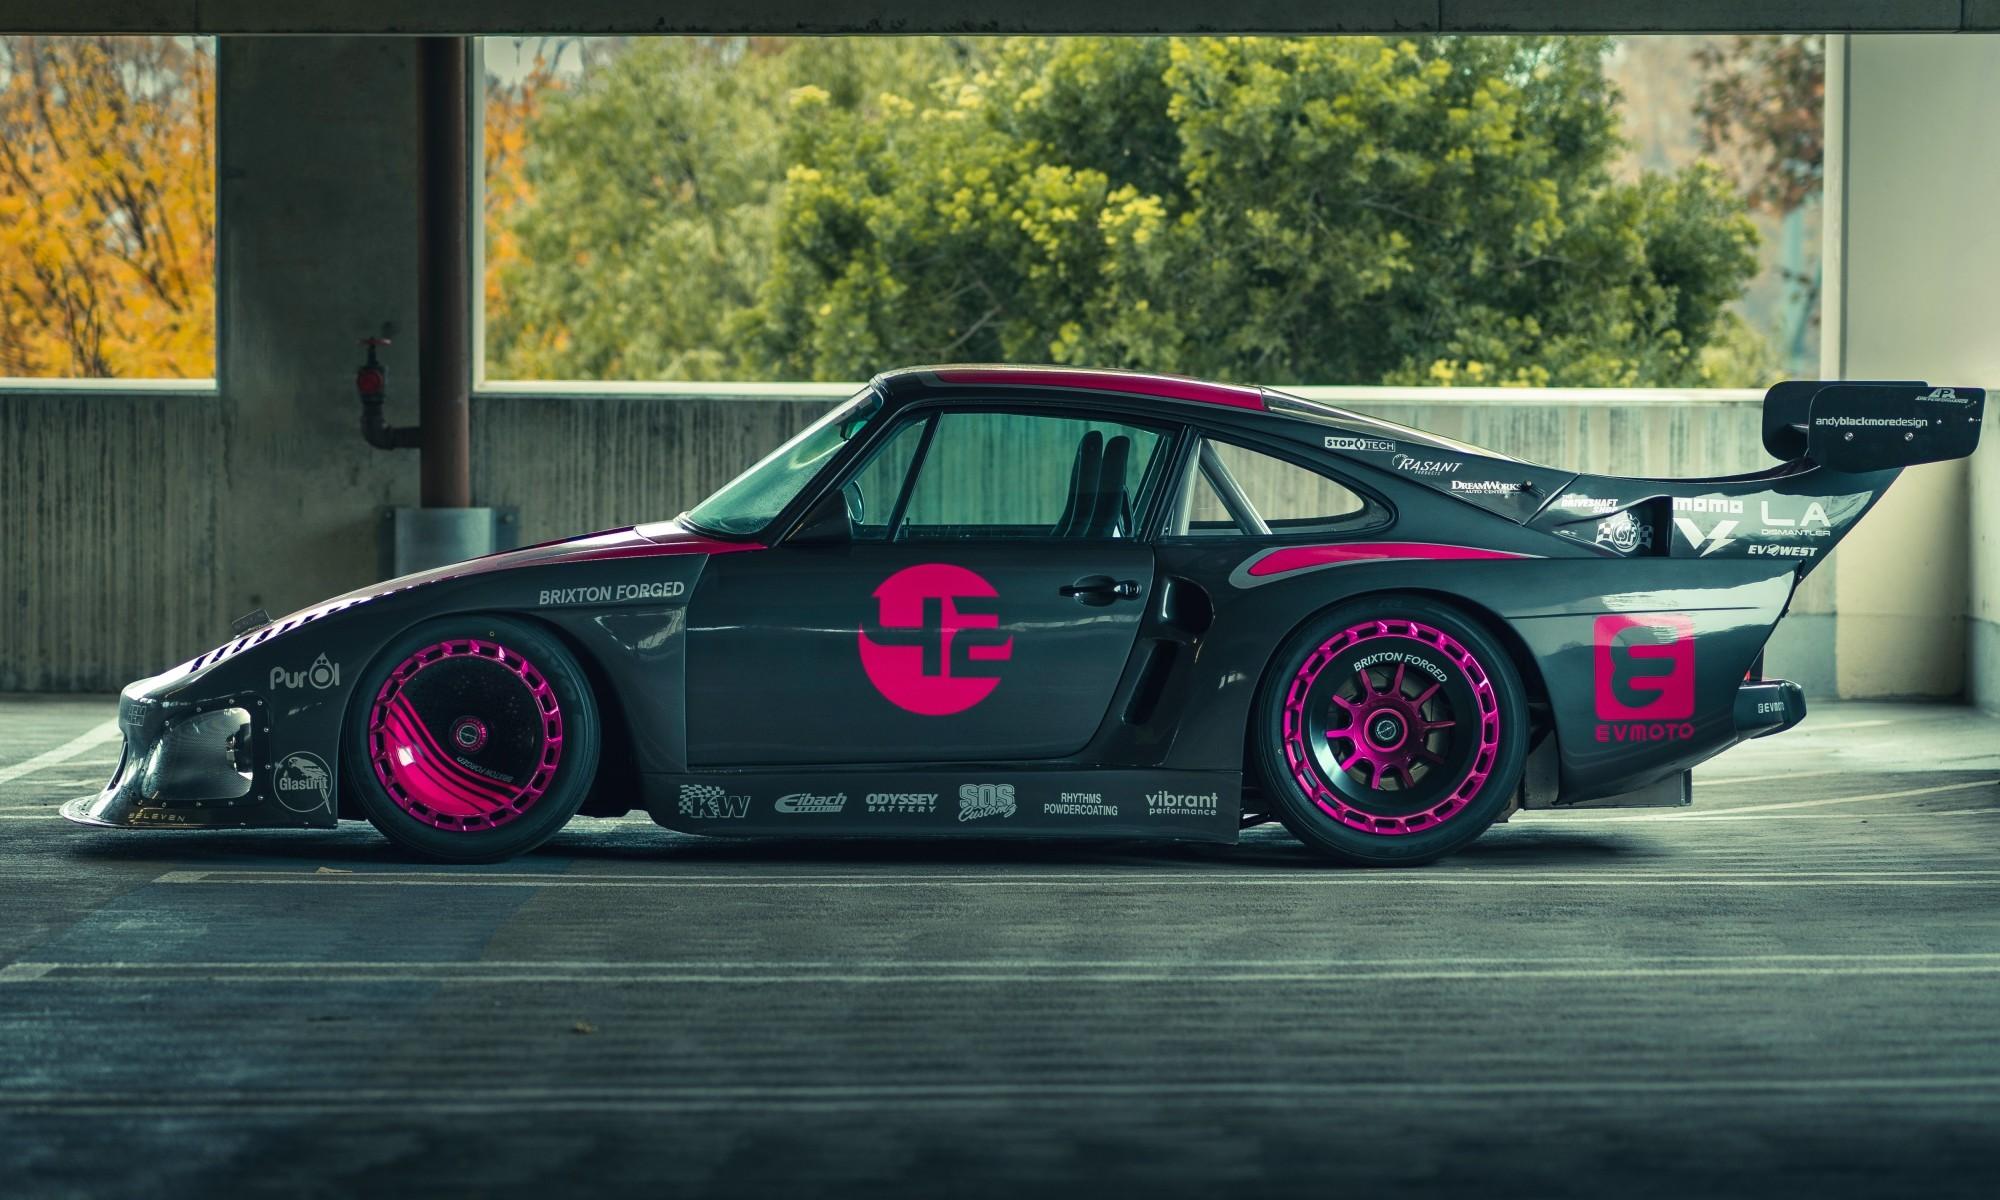 Bisimoto Electric Porsche 935 profile